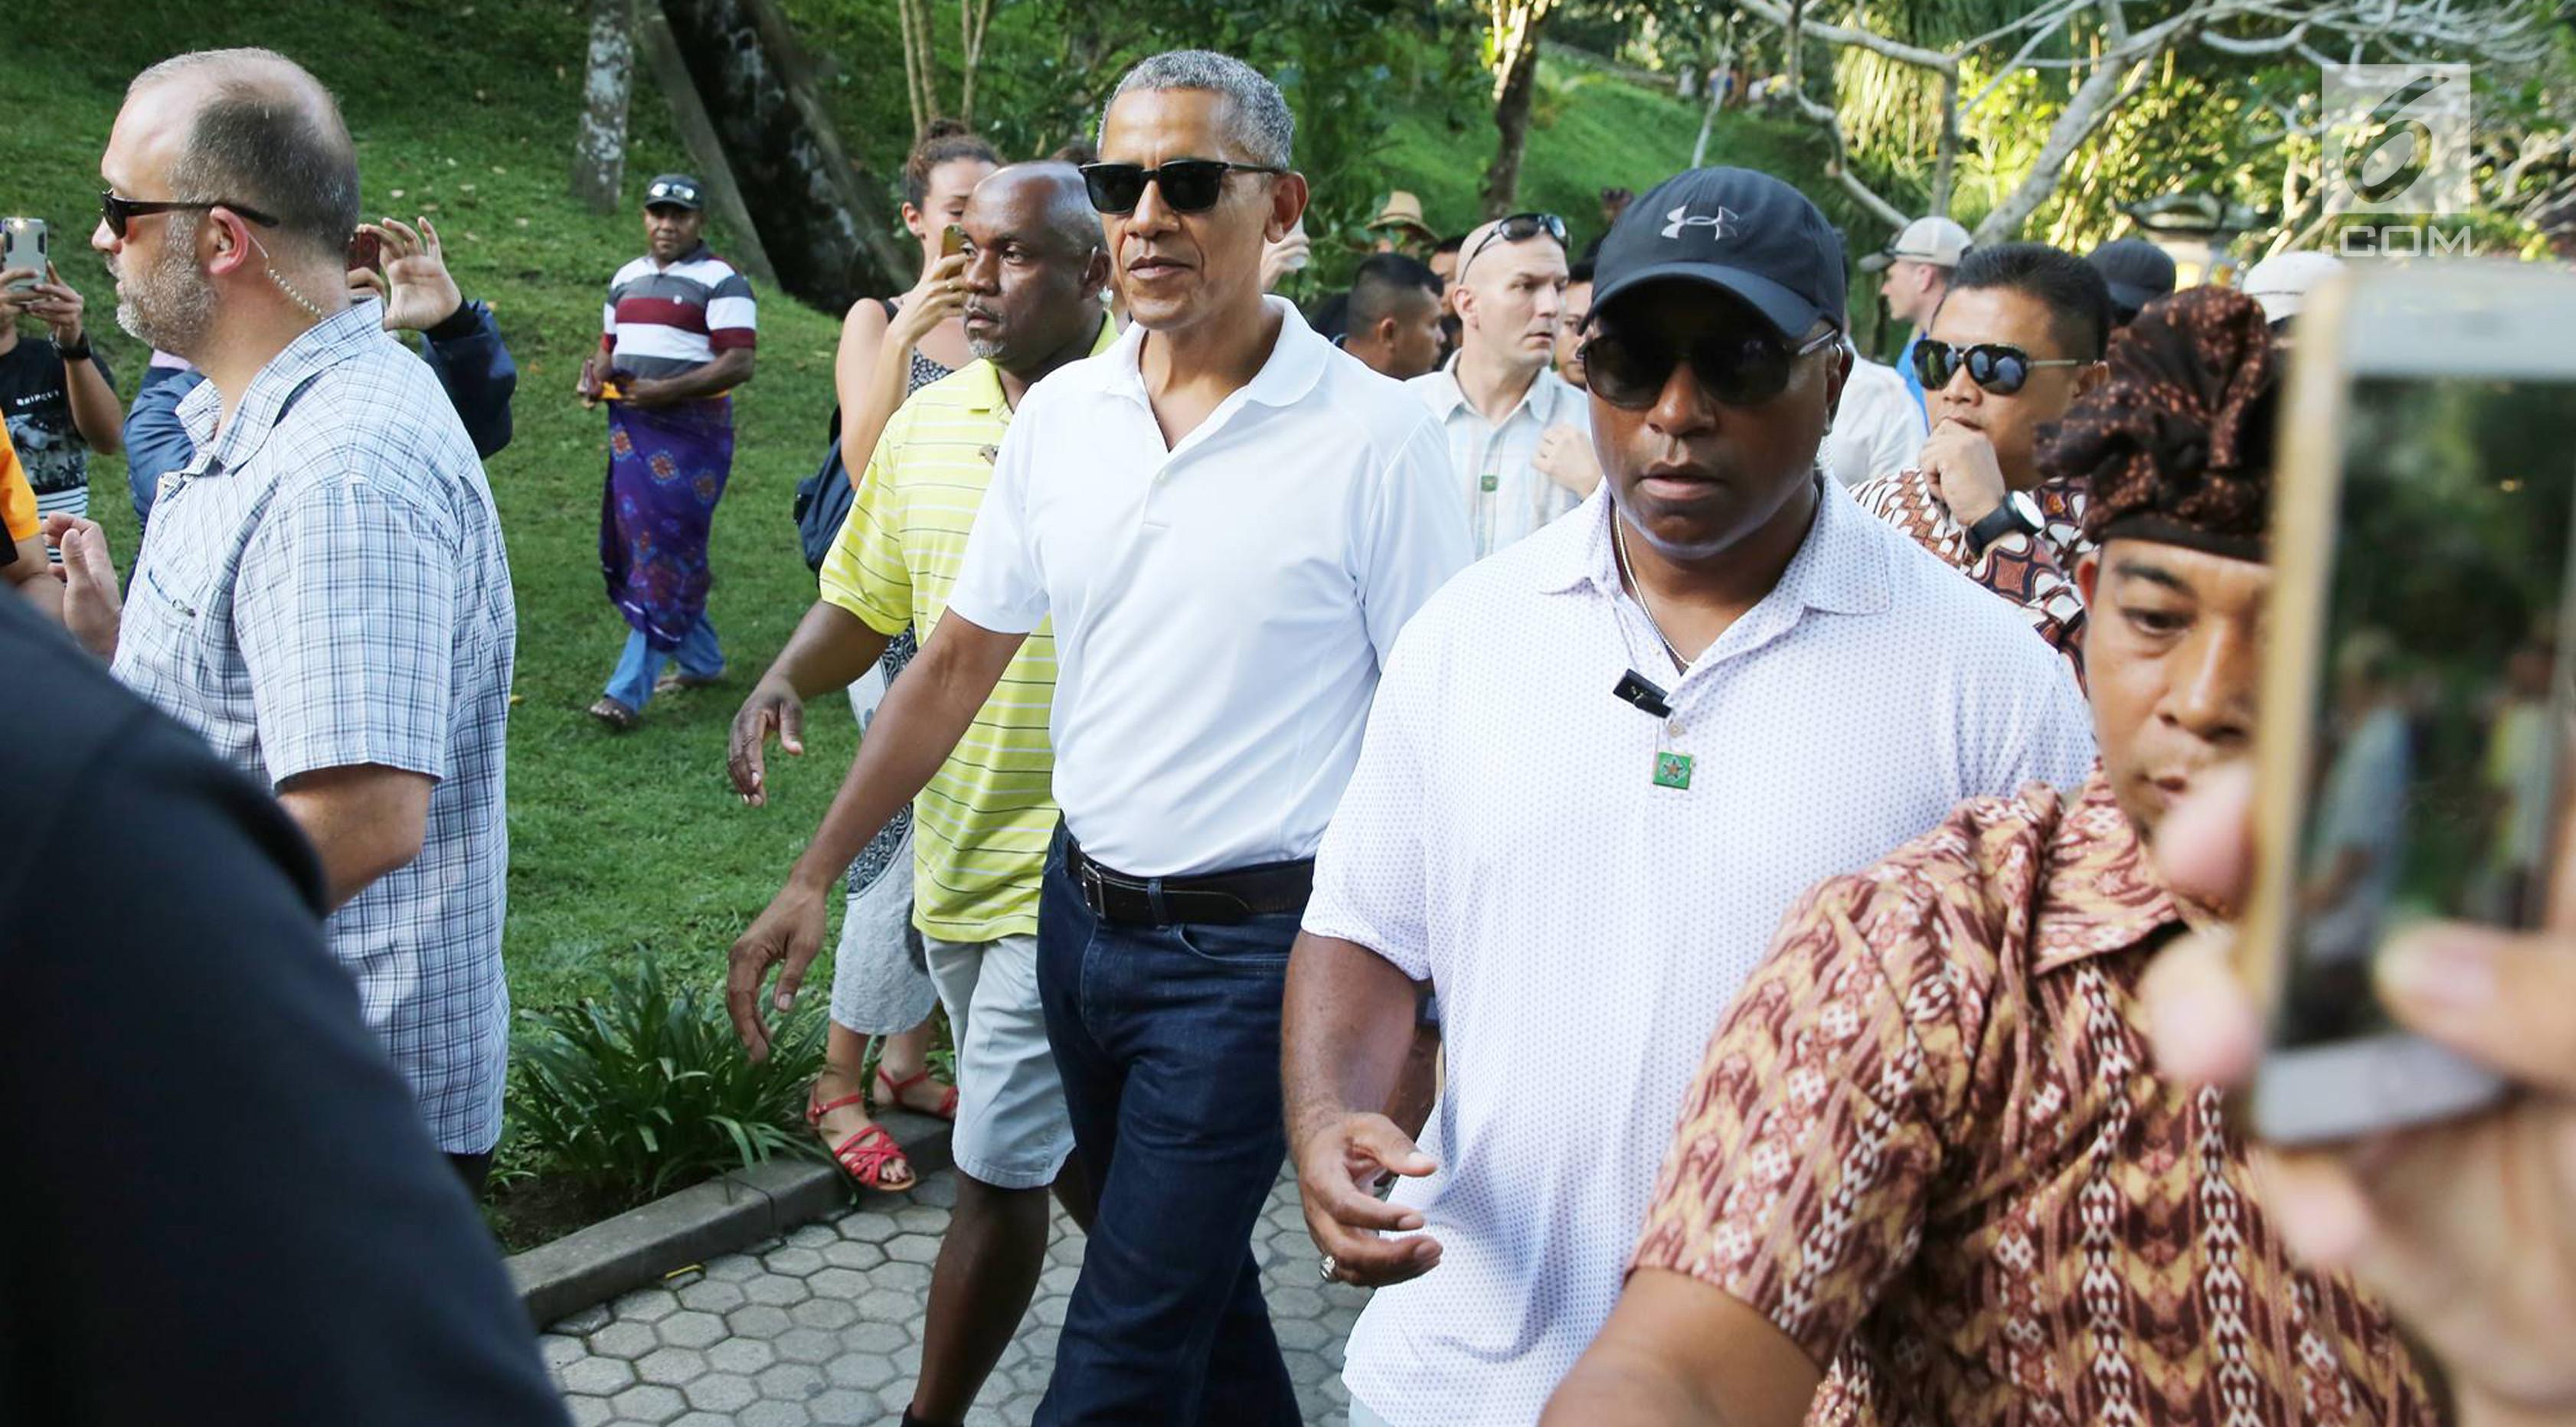 Mantan Presiden Amerika Serikat Barack Obama bersama keluarga dan rombongannya mengunjungi Pura Tirta Empul, Tampaksiring, Gianyar, Bali, Selasa (27/6). (Liputan6.com/Immanuel Antonius)